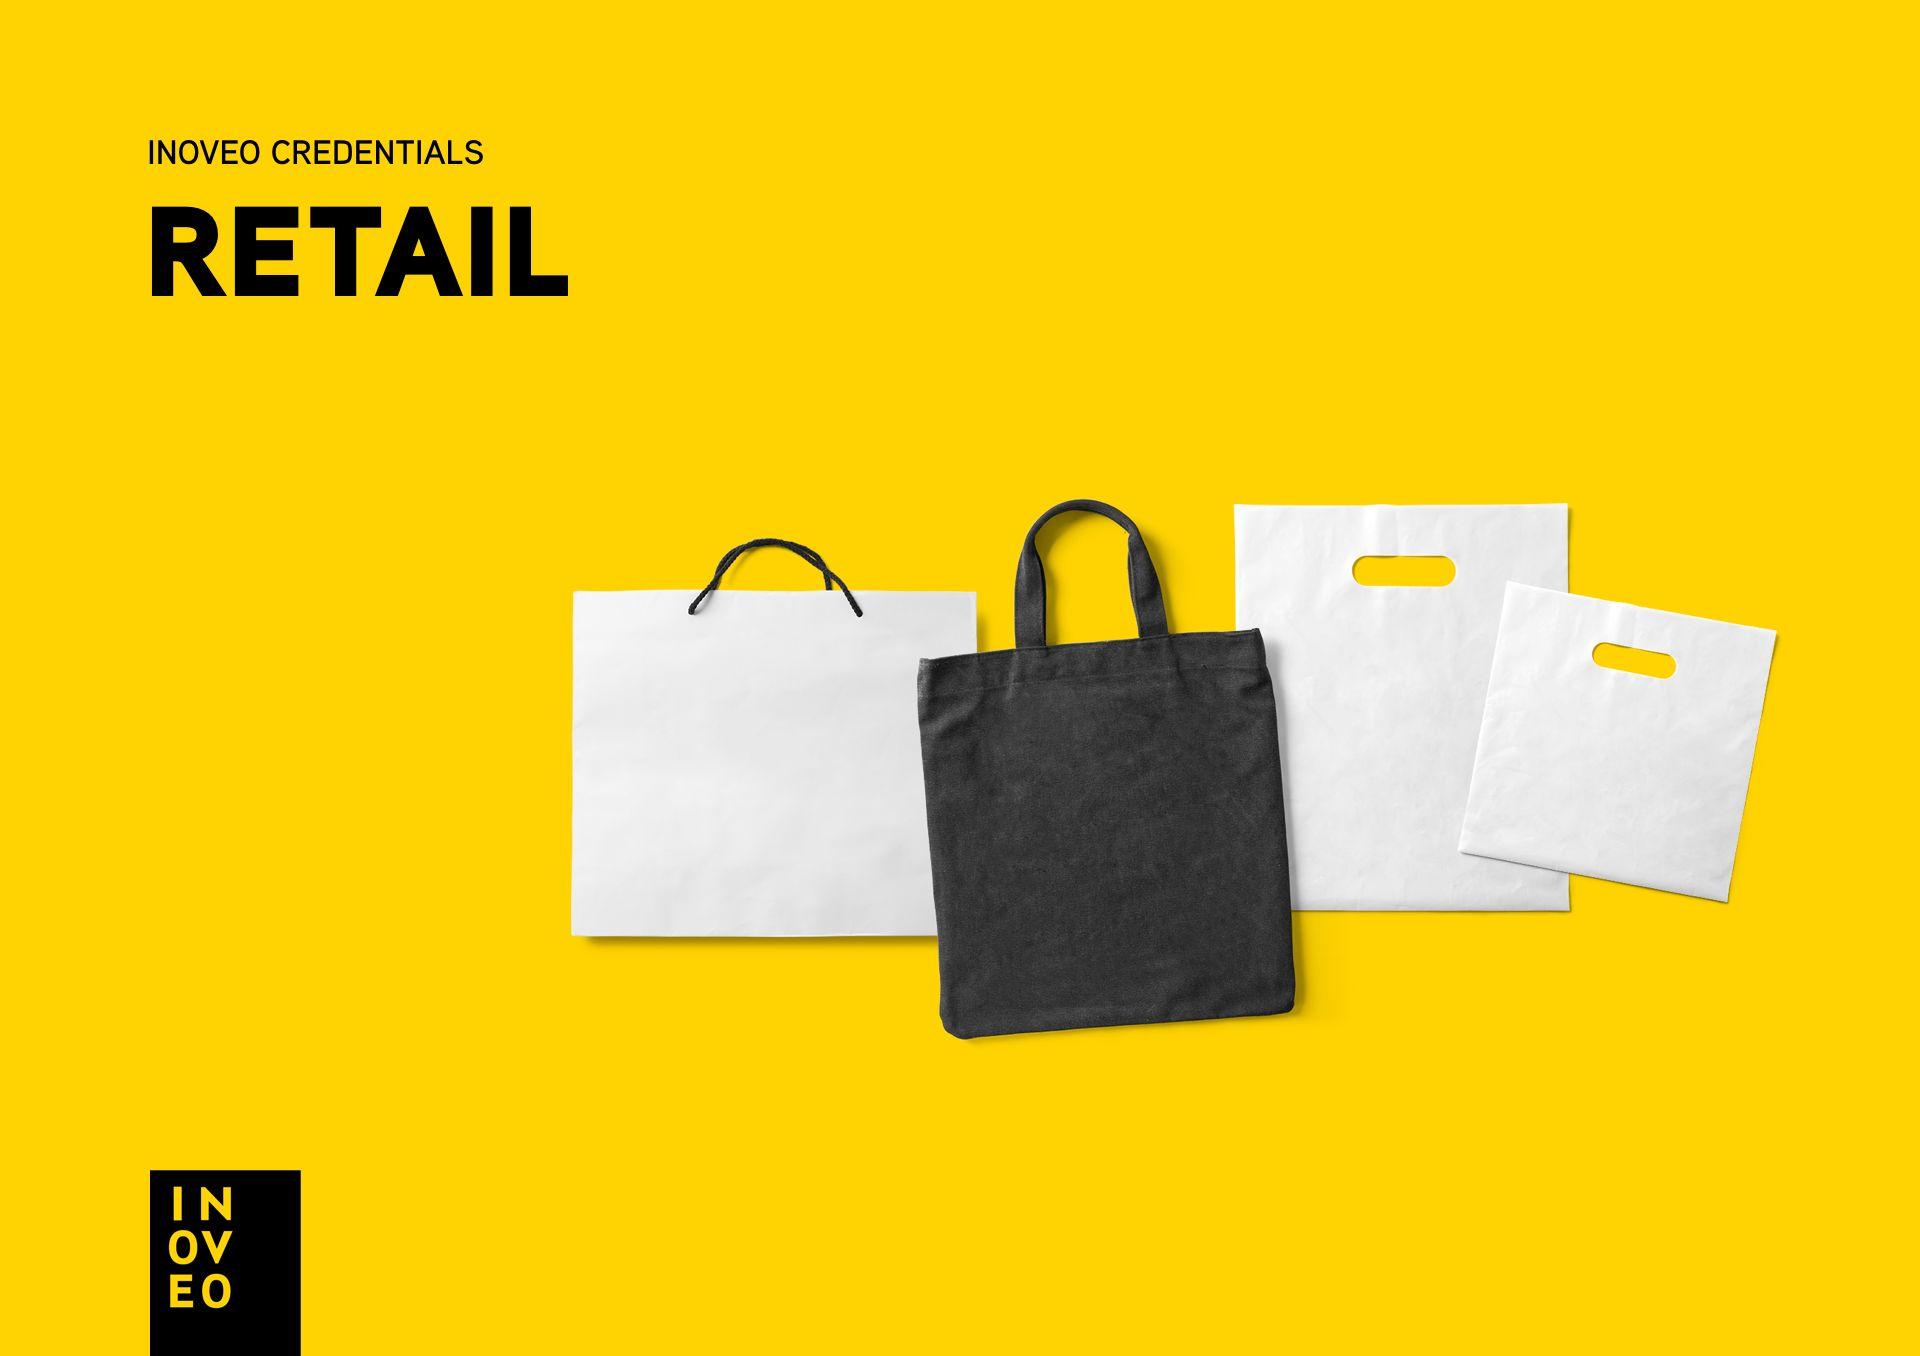 Retail credentials INOVEO branding